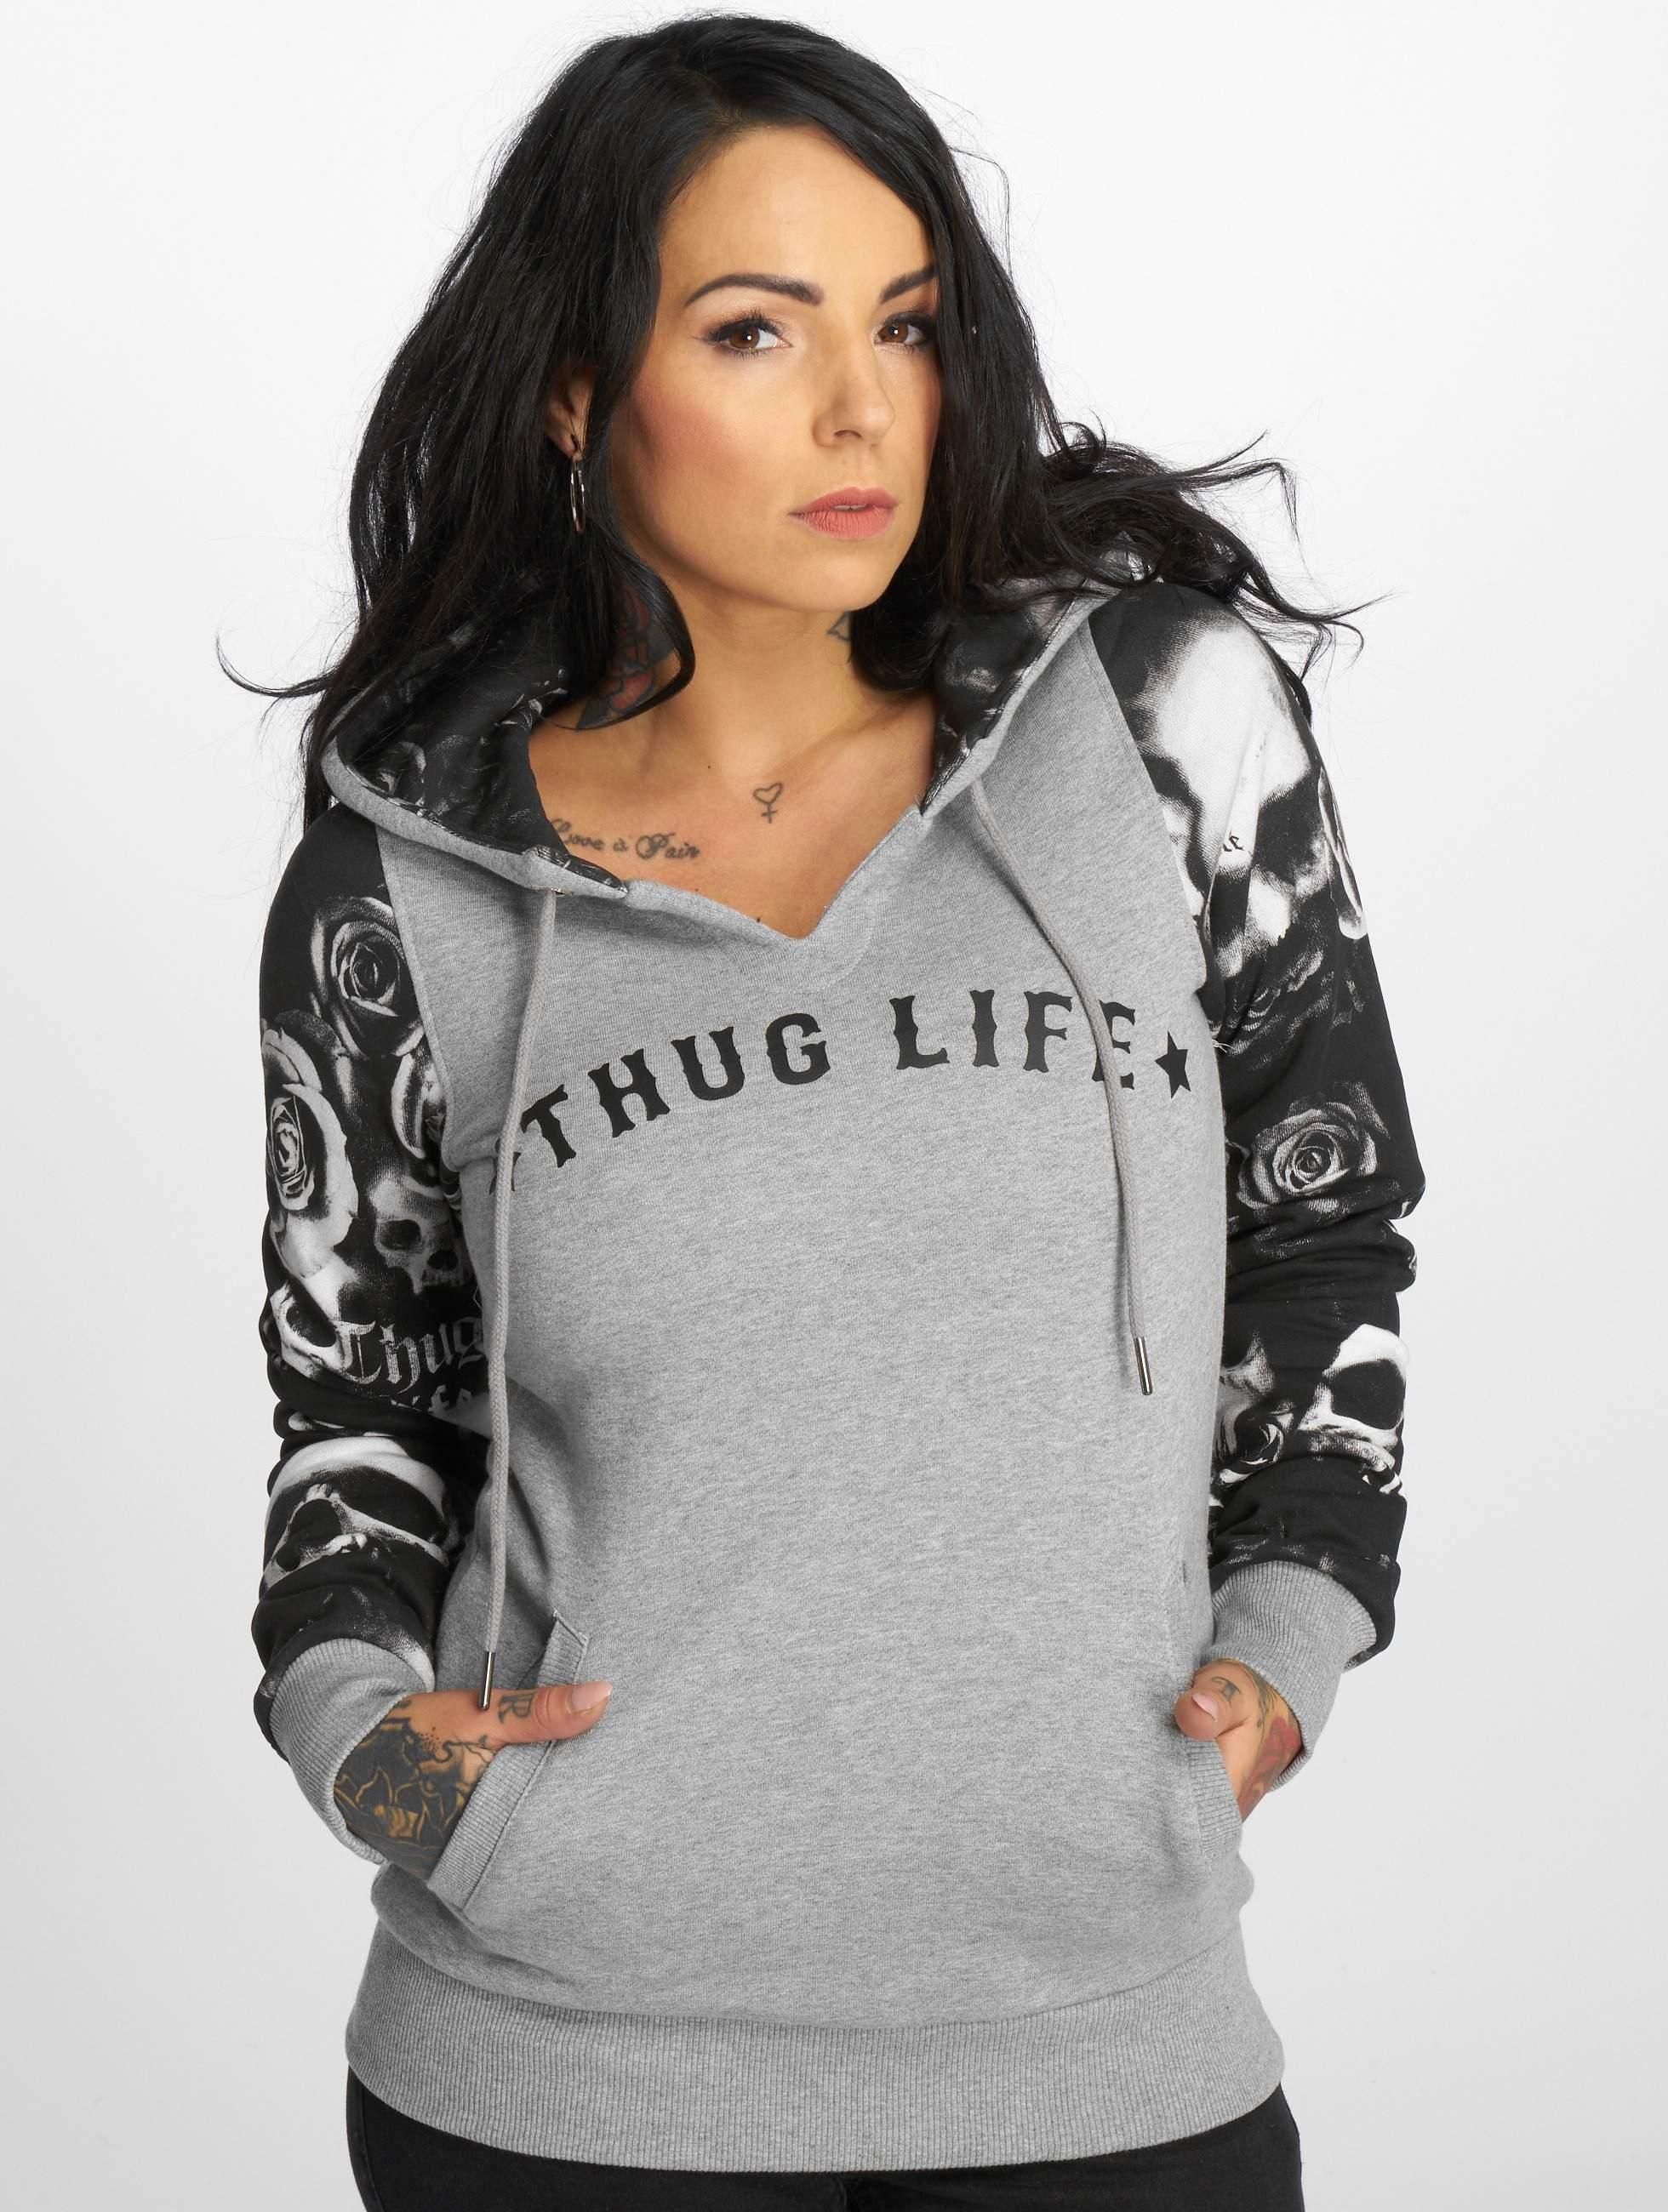 Thug Life / Hoodie Skullpattern in grey XL